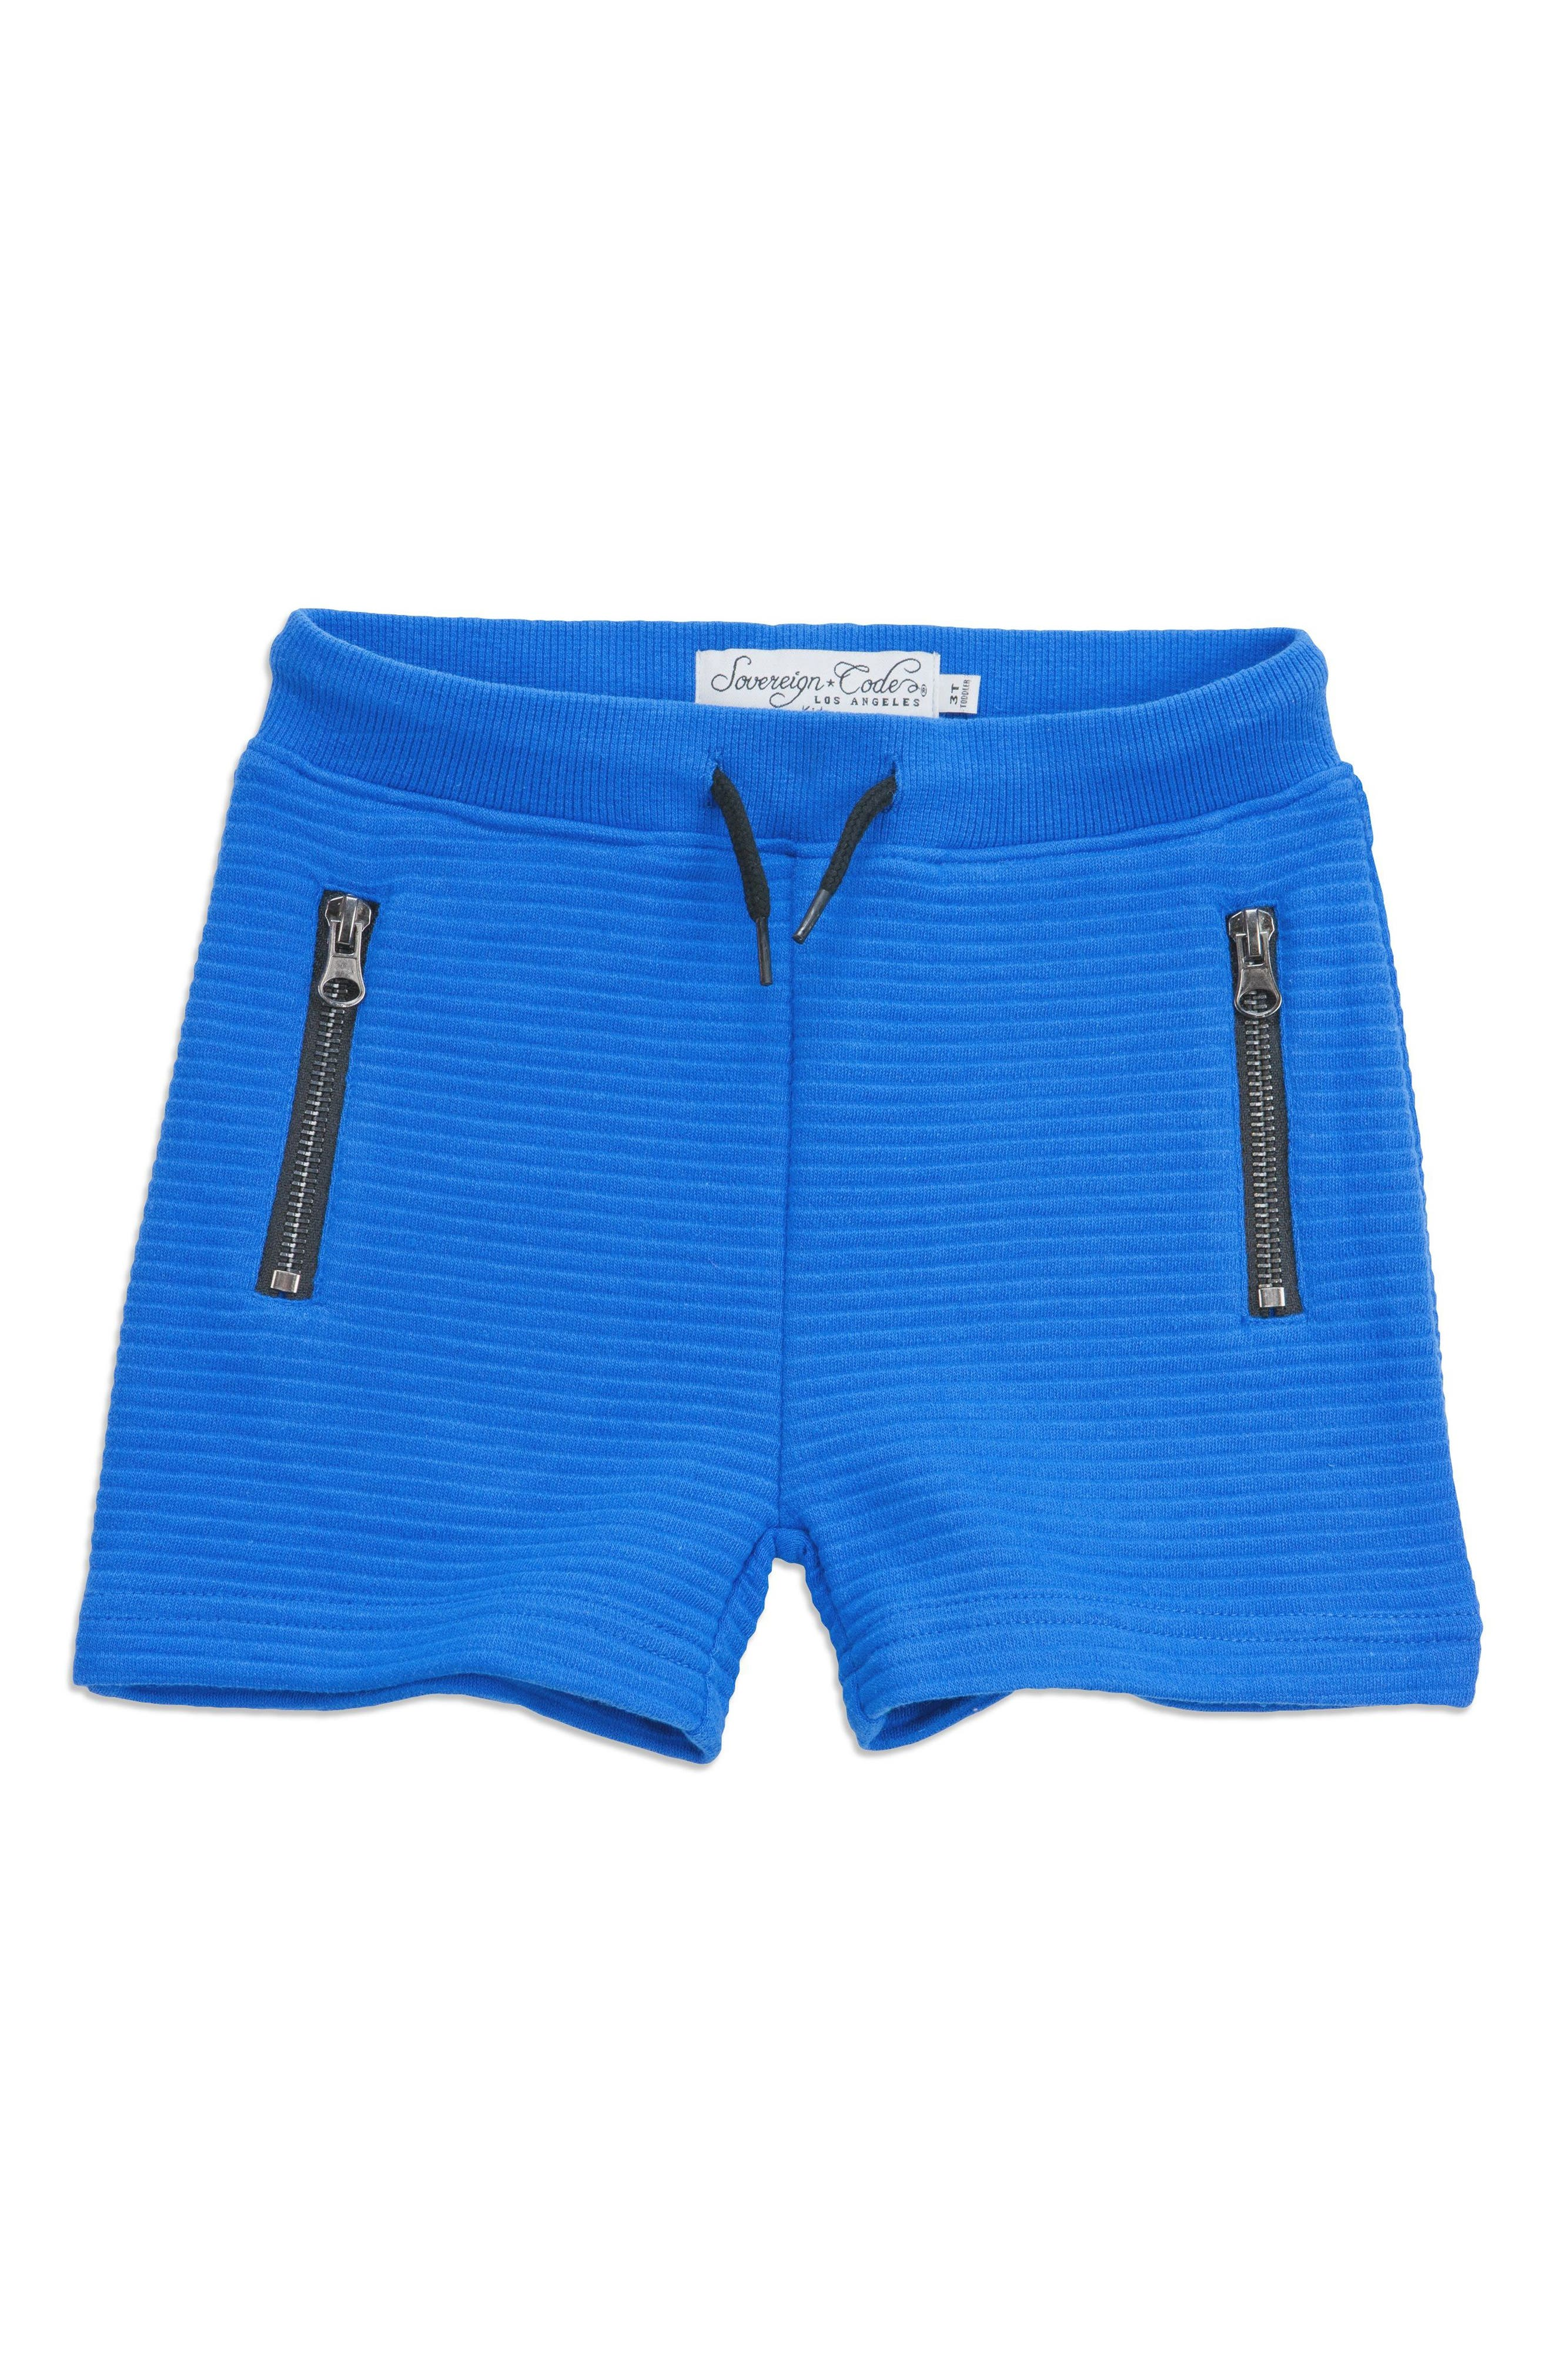 Academy Shorts,                             Main thumbnail 1, color,                             Cobalt